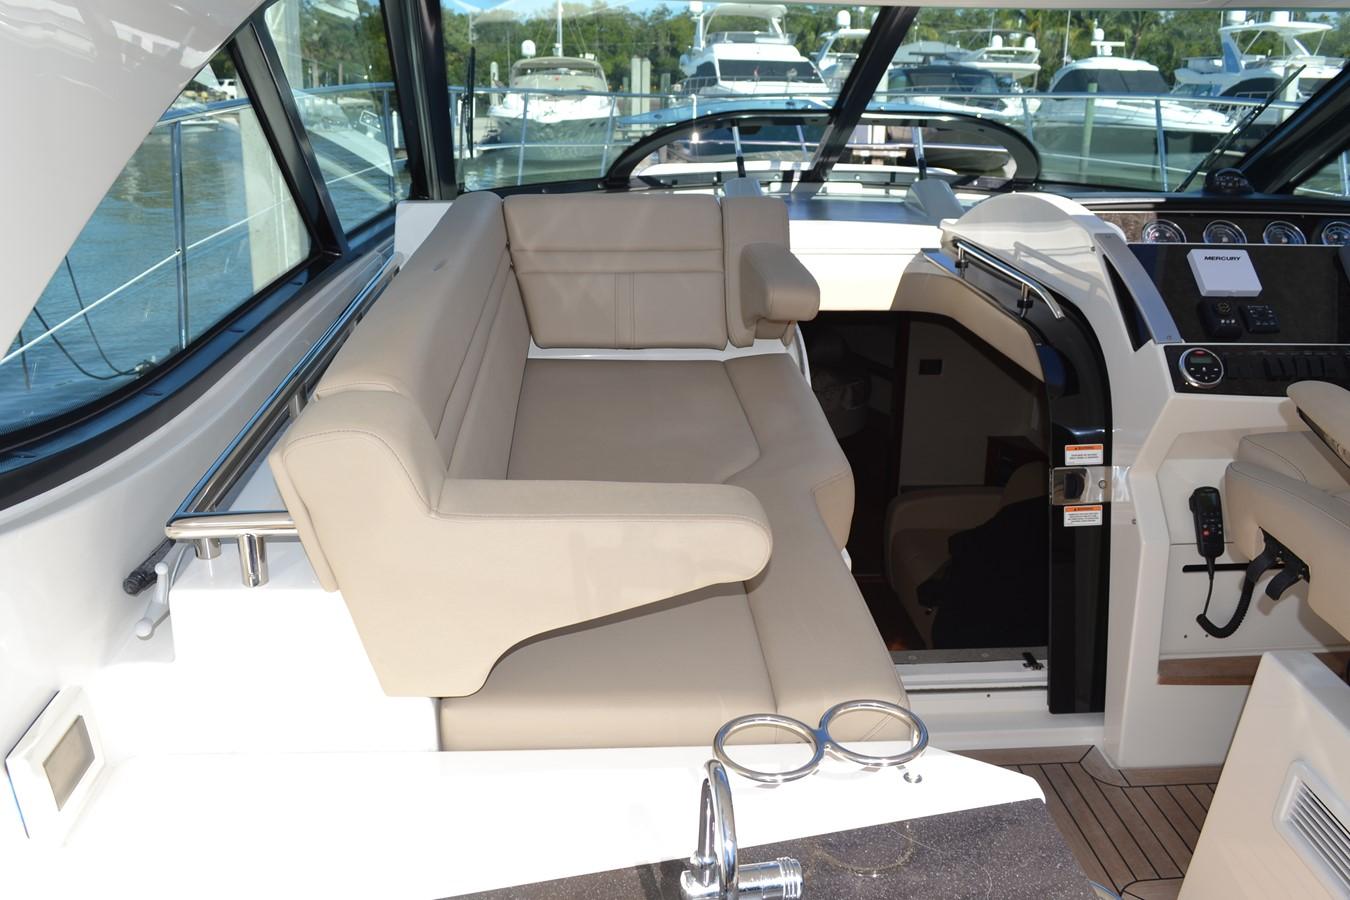 Immaculate Leather soft goods  2015 SEA RAY 410 Sundancer Motor Yacht 1685737